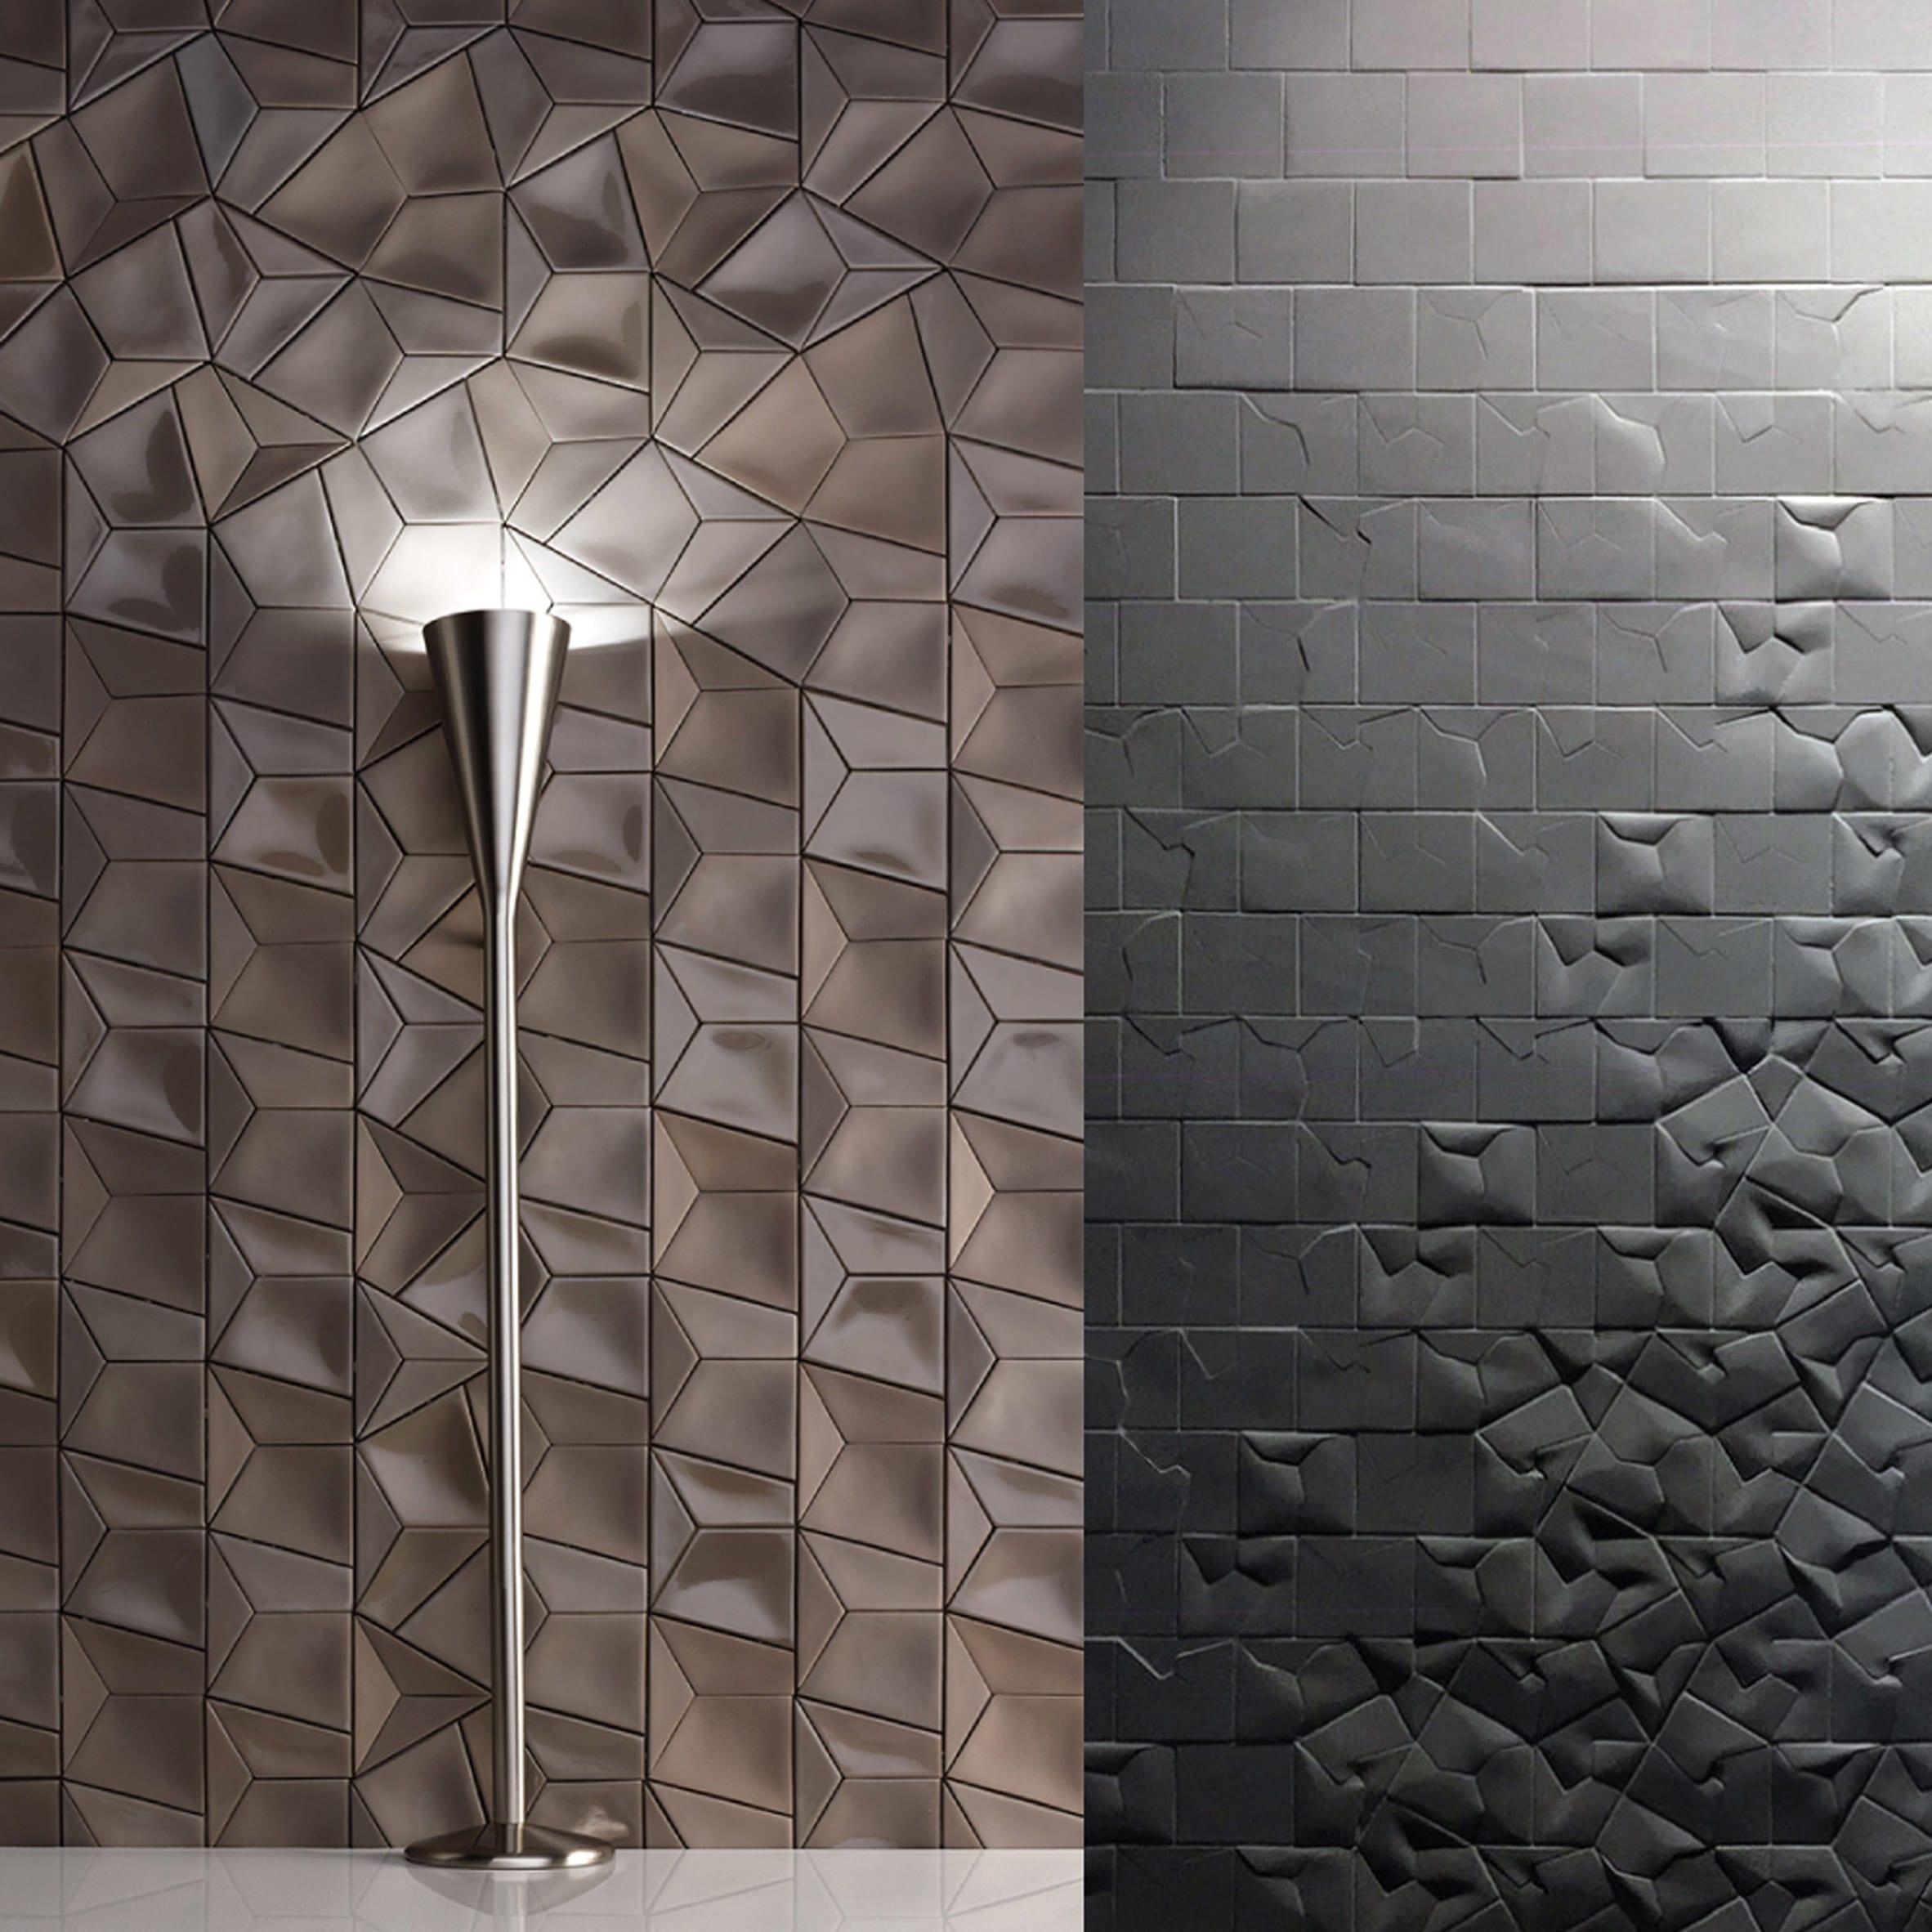 Squar(e) tiles by Giovanni Barbieri